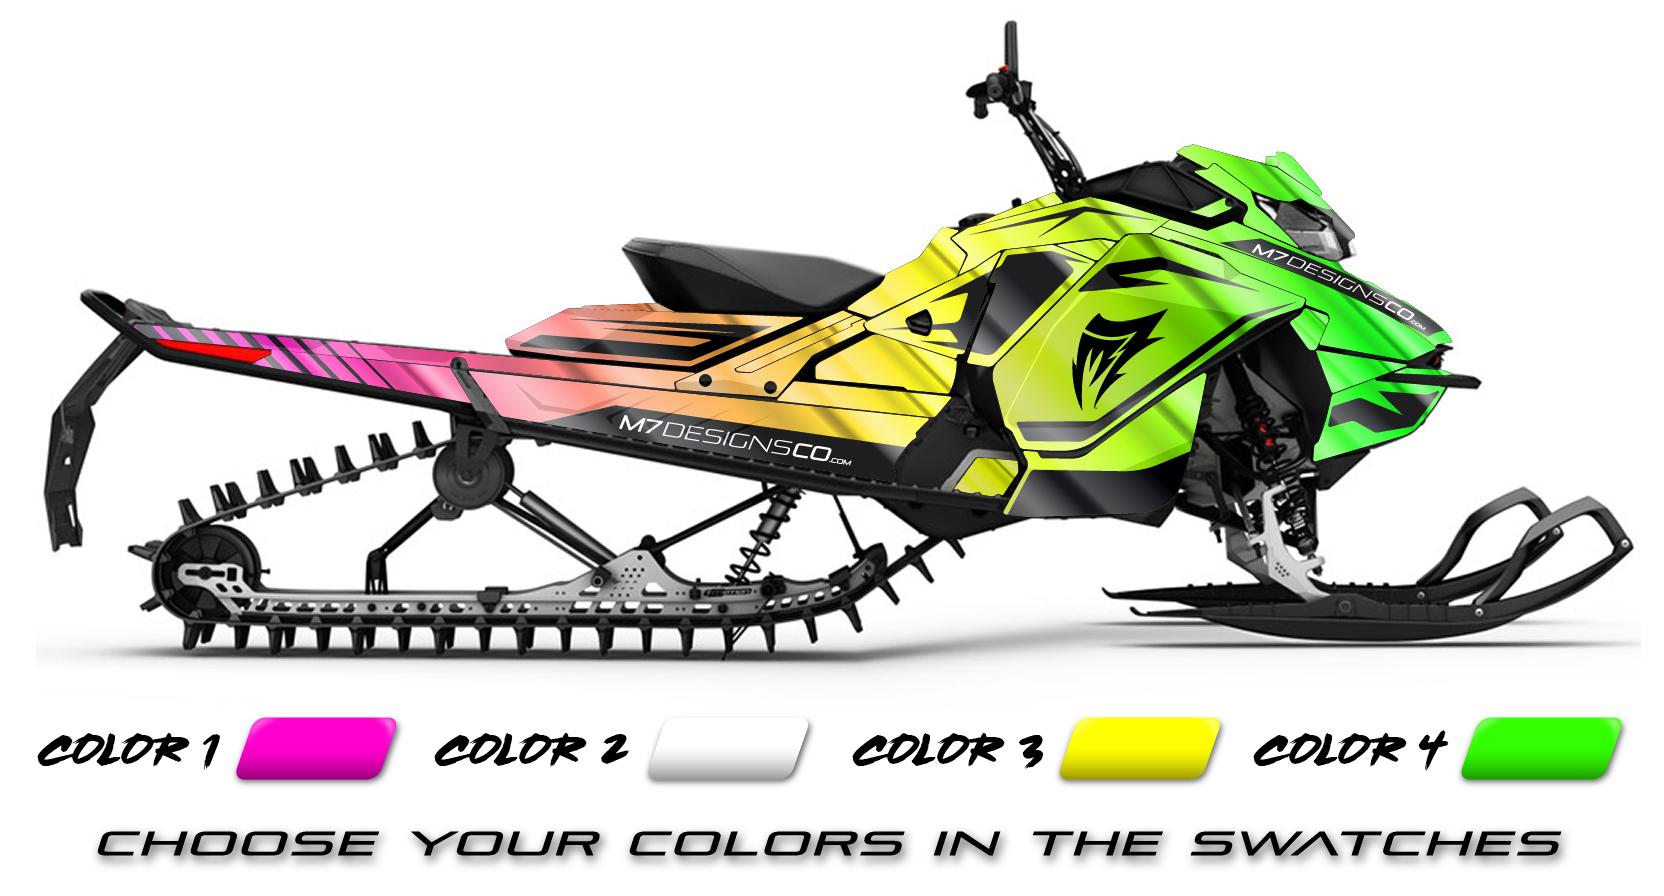 Dekalkit Se Dekalkit M7designsco Ski Doo Fade Chrome